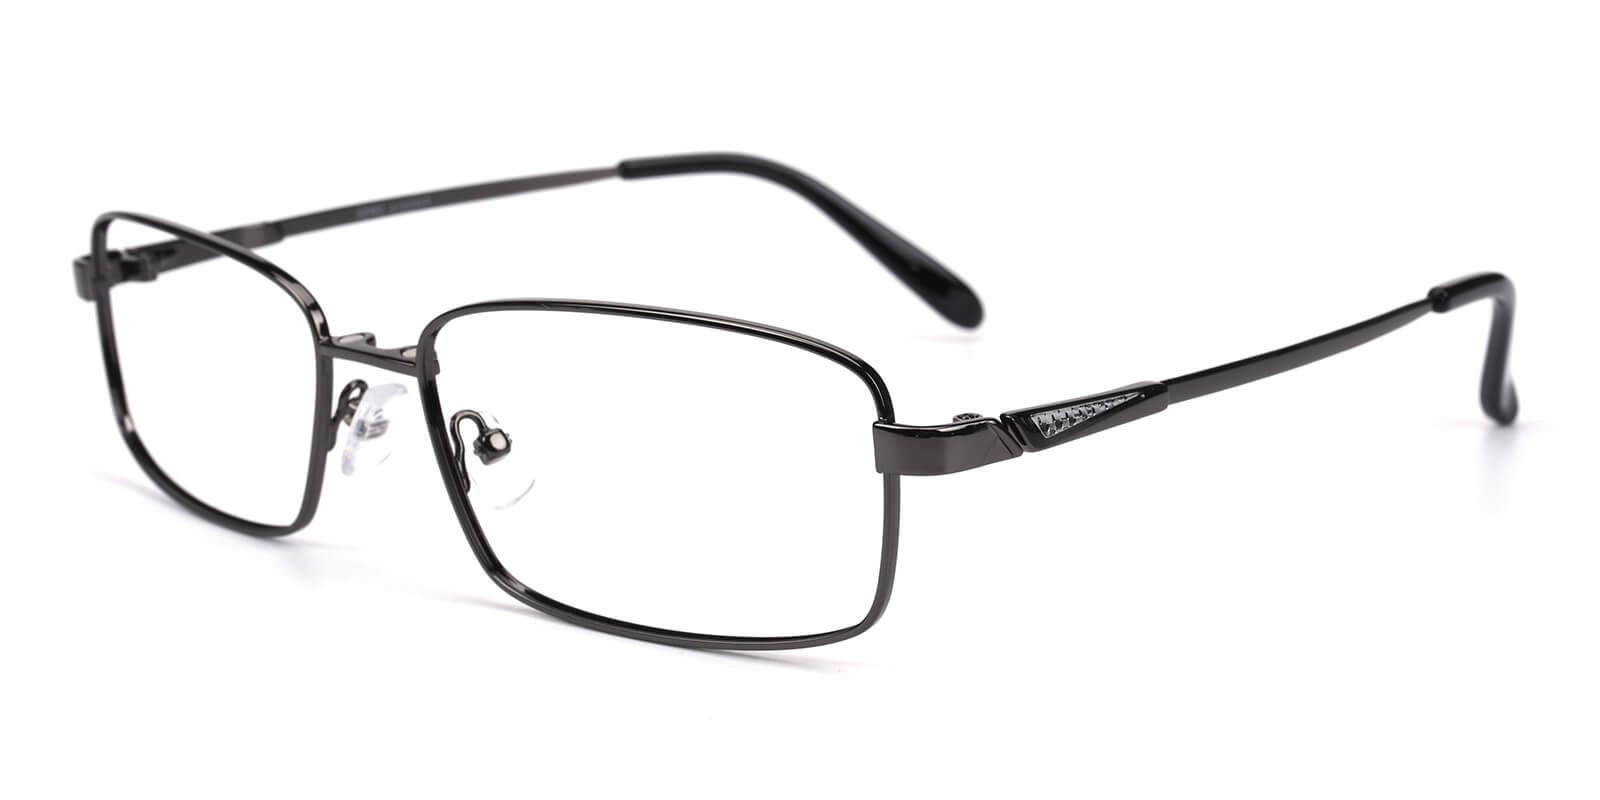 Alden-Gun-Rectangle-Metal-Eyeglasses-additional1